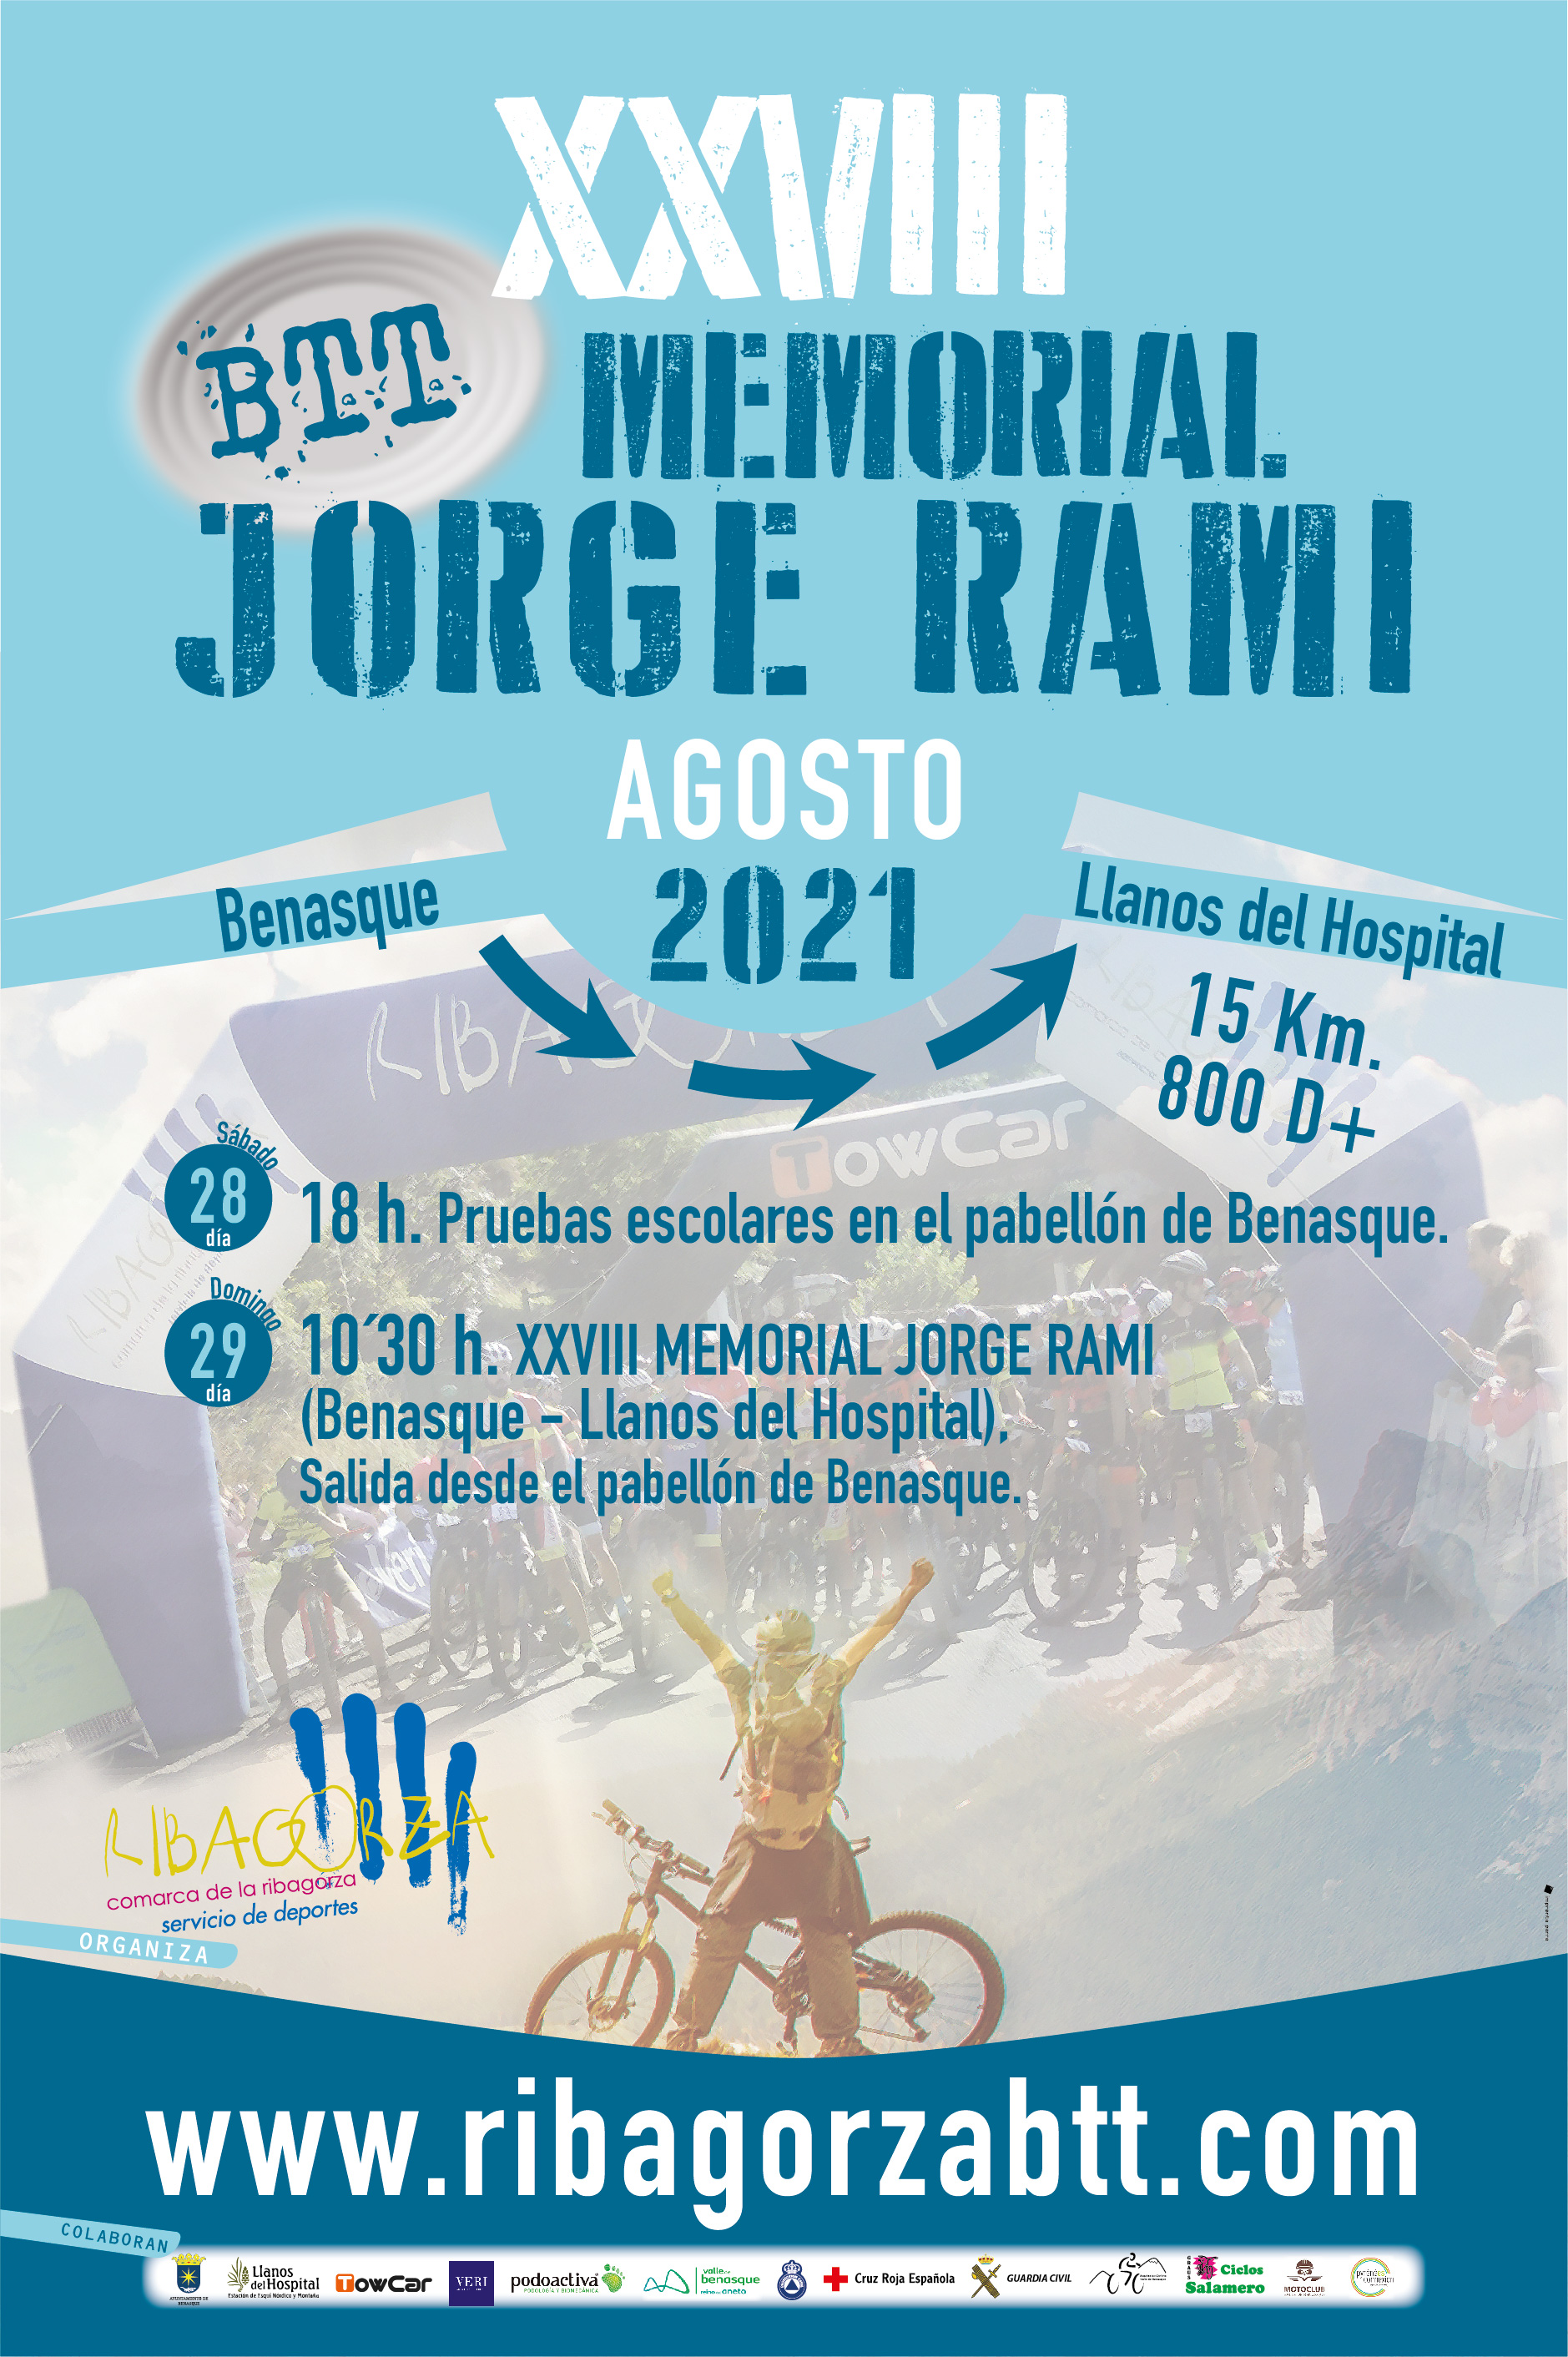 XXVIII MEMORIAL JORGE RAMI